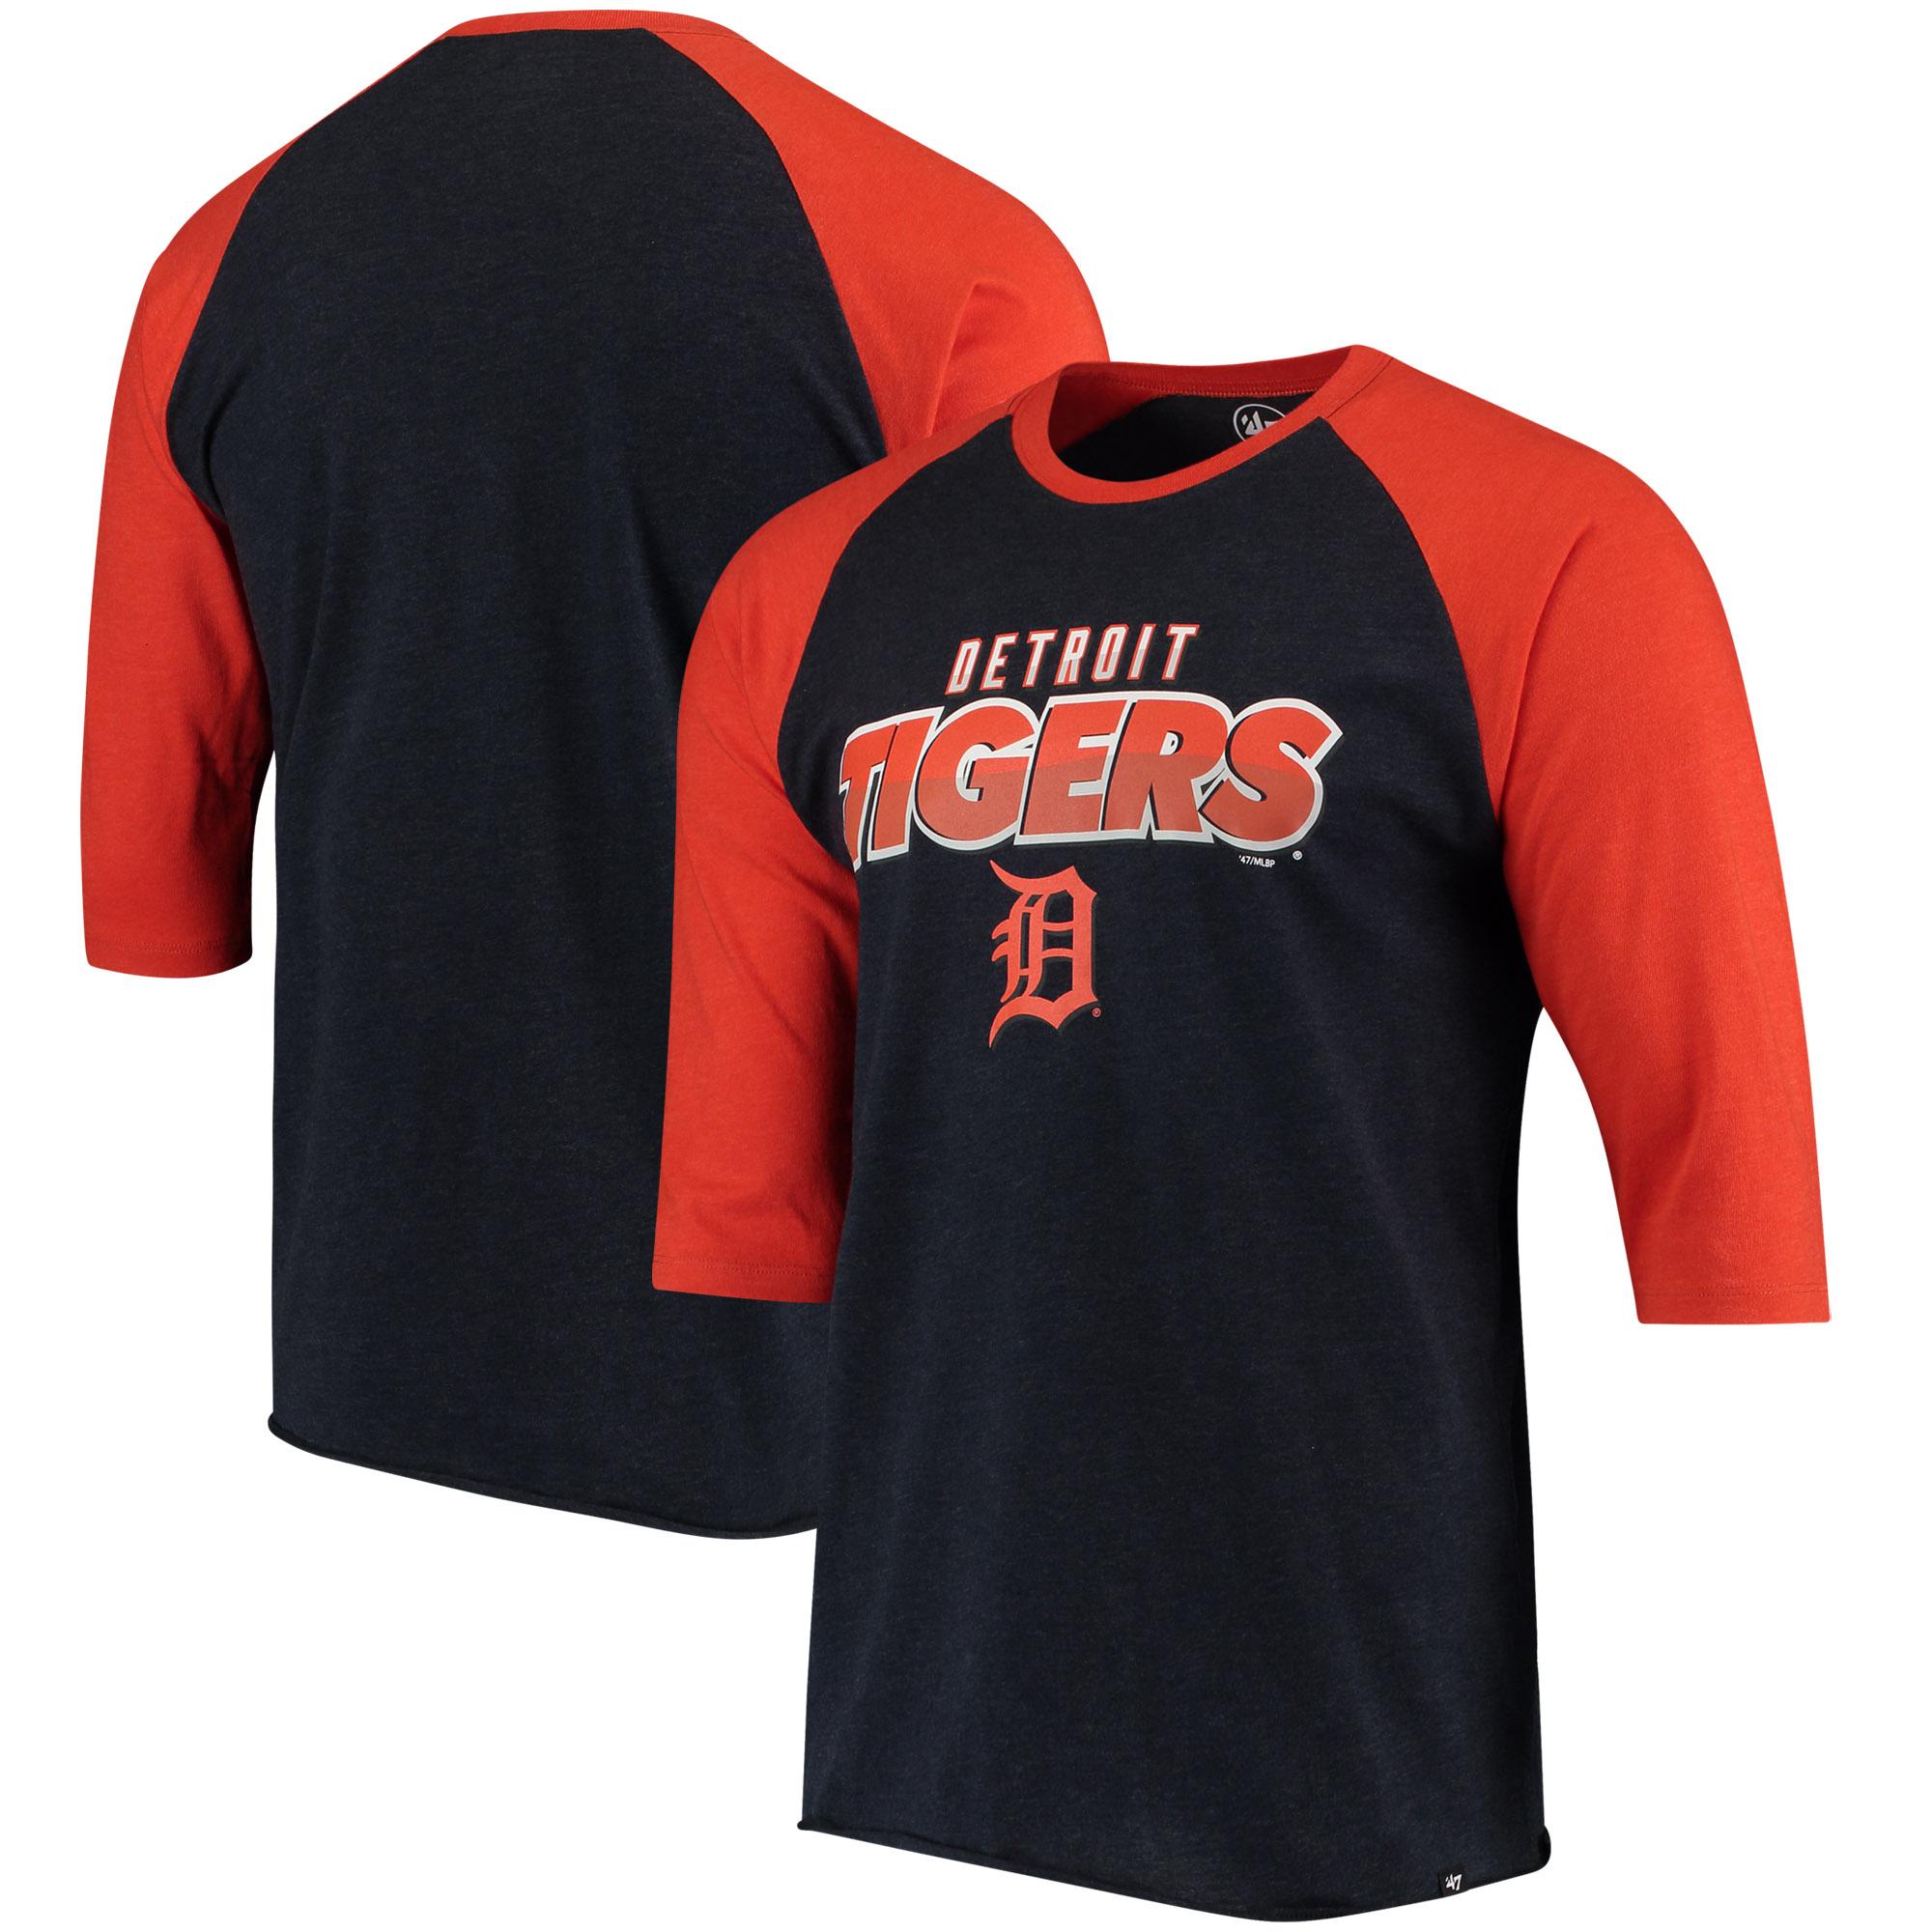 Detroit Tigers '47 Club 3/4-Sleeve Raglan T-Shirt - Navy